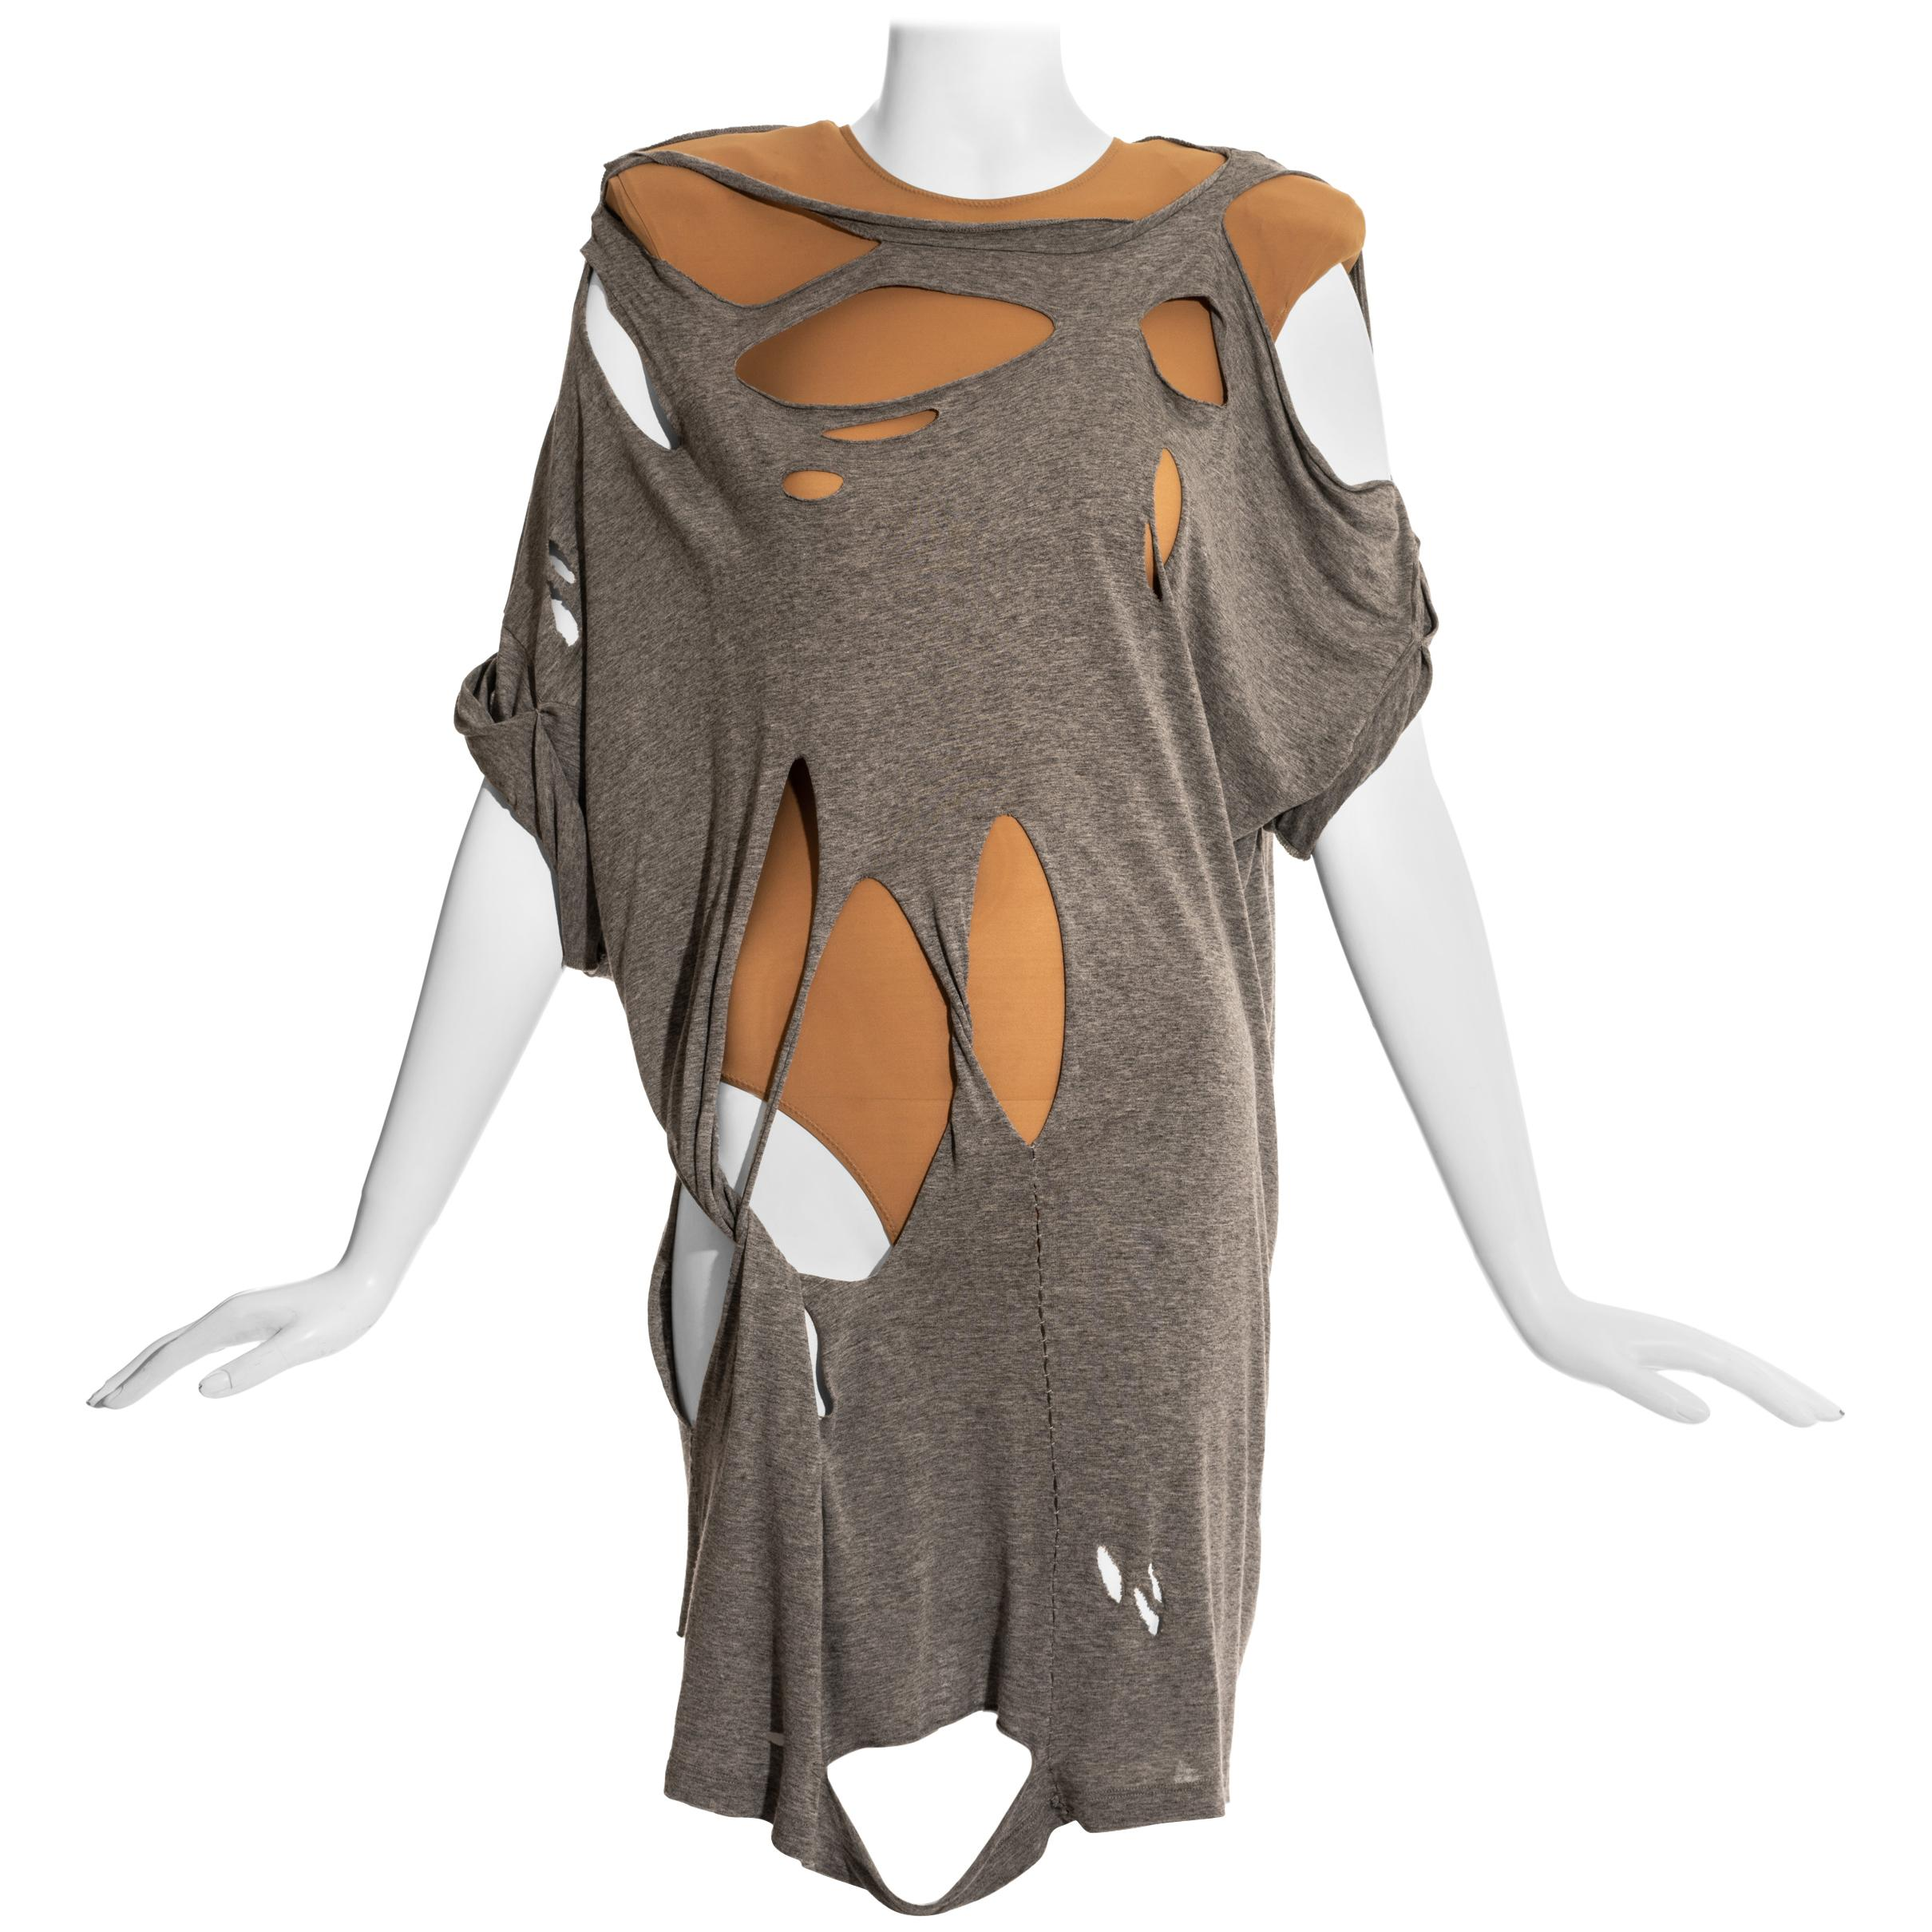 Margiela grey cotton shredded t-shirt and nude lycra bodysuit ensemble, ss 2009